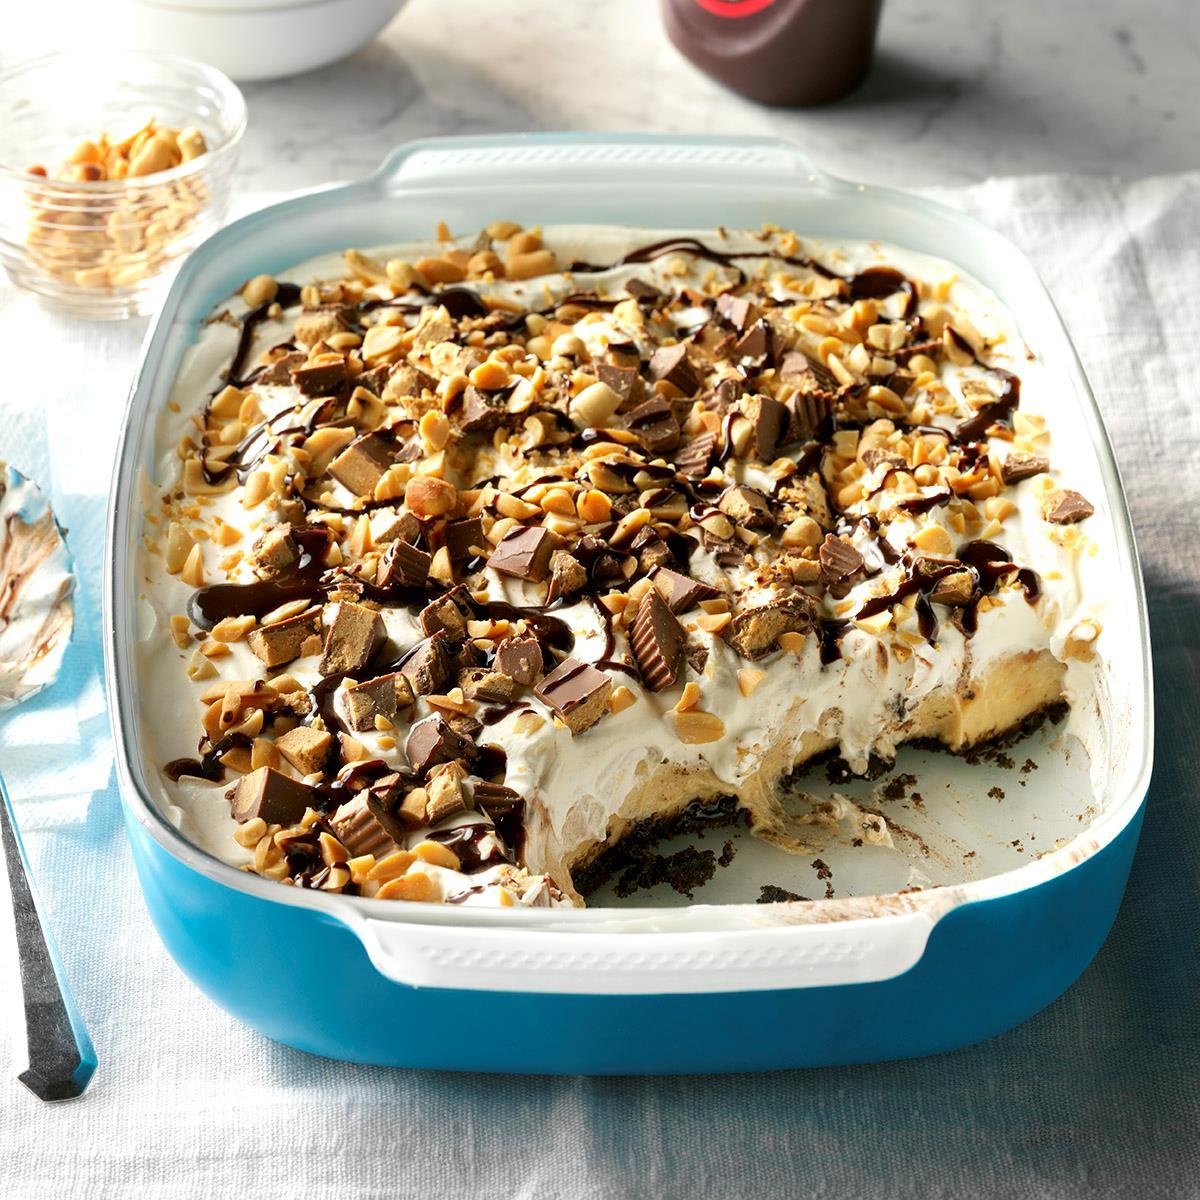 Peanut Butter Dessert Recipes: Peanut Butter Custard Blast Recipe